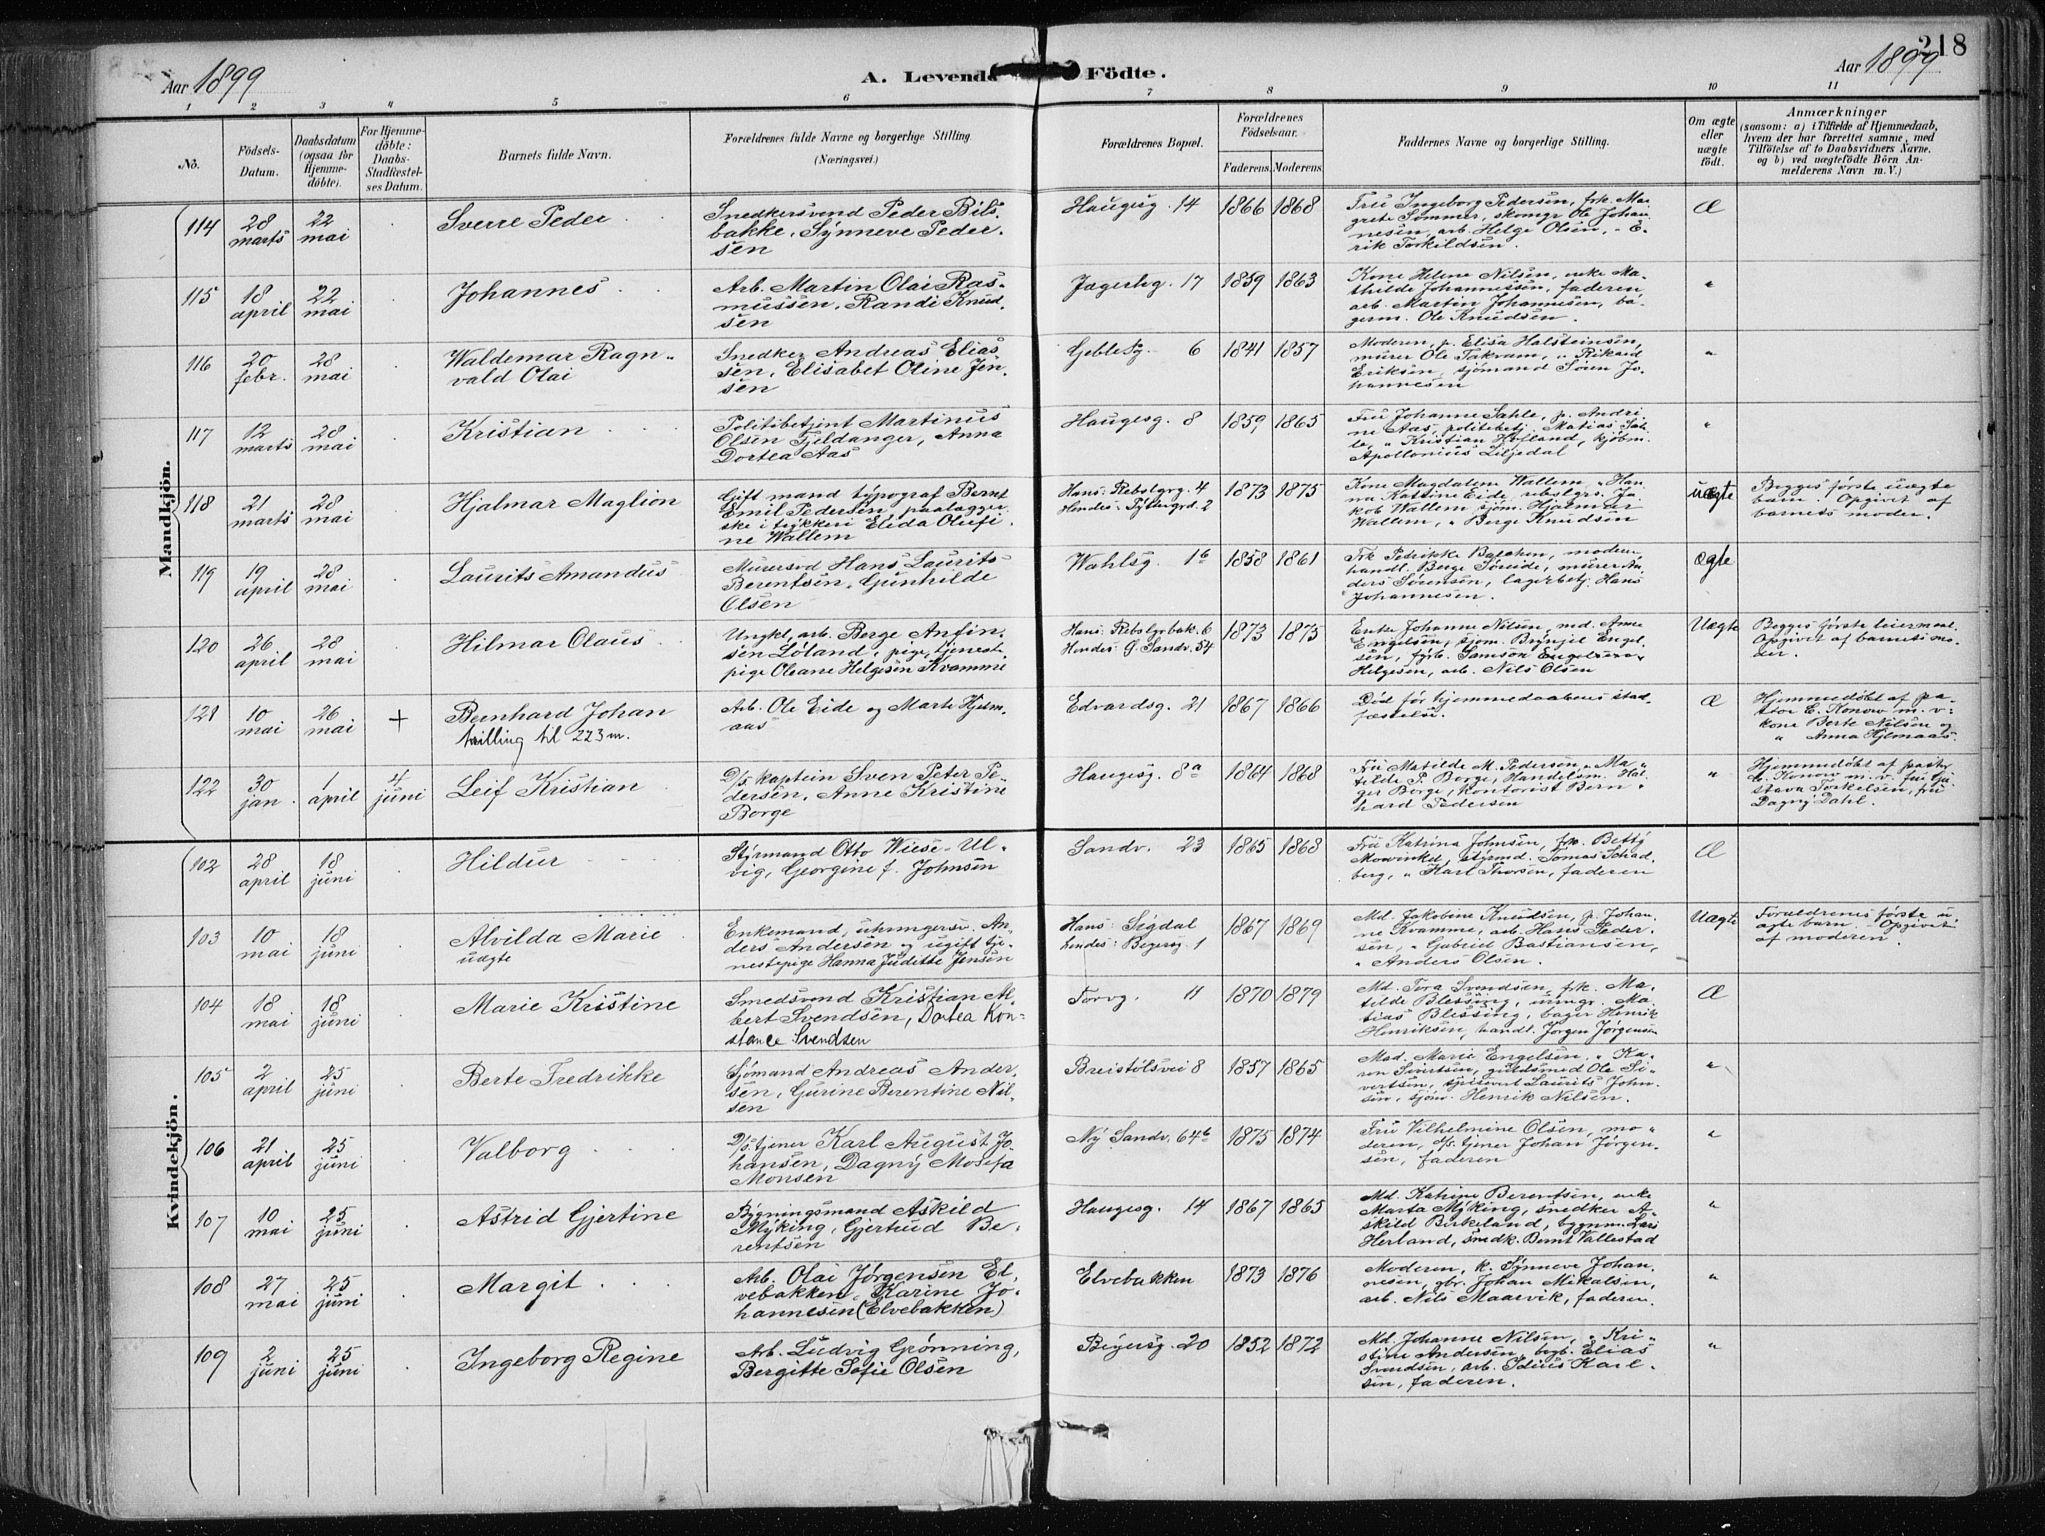 SAB, Sandviken Sokneprestembete, H/Haa/L0005: Ministerialbok nr. B 2, 1891-1901, s. 218